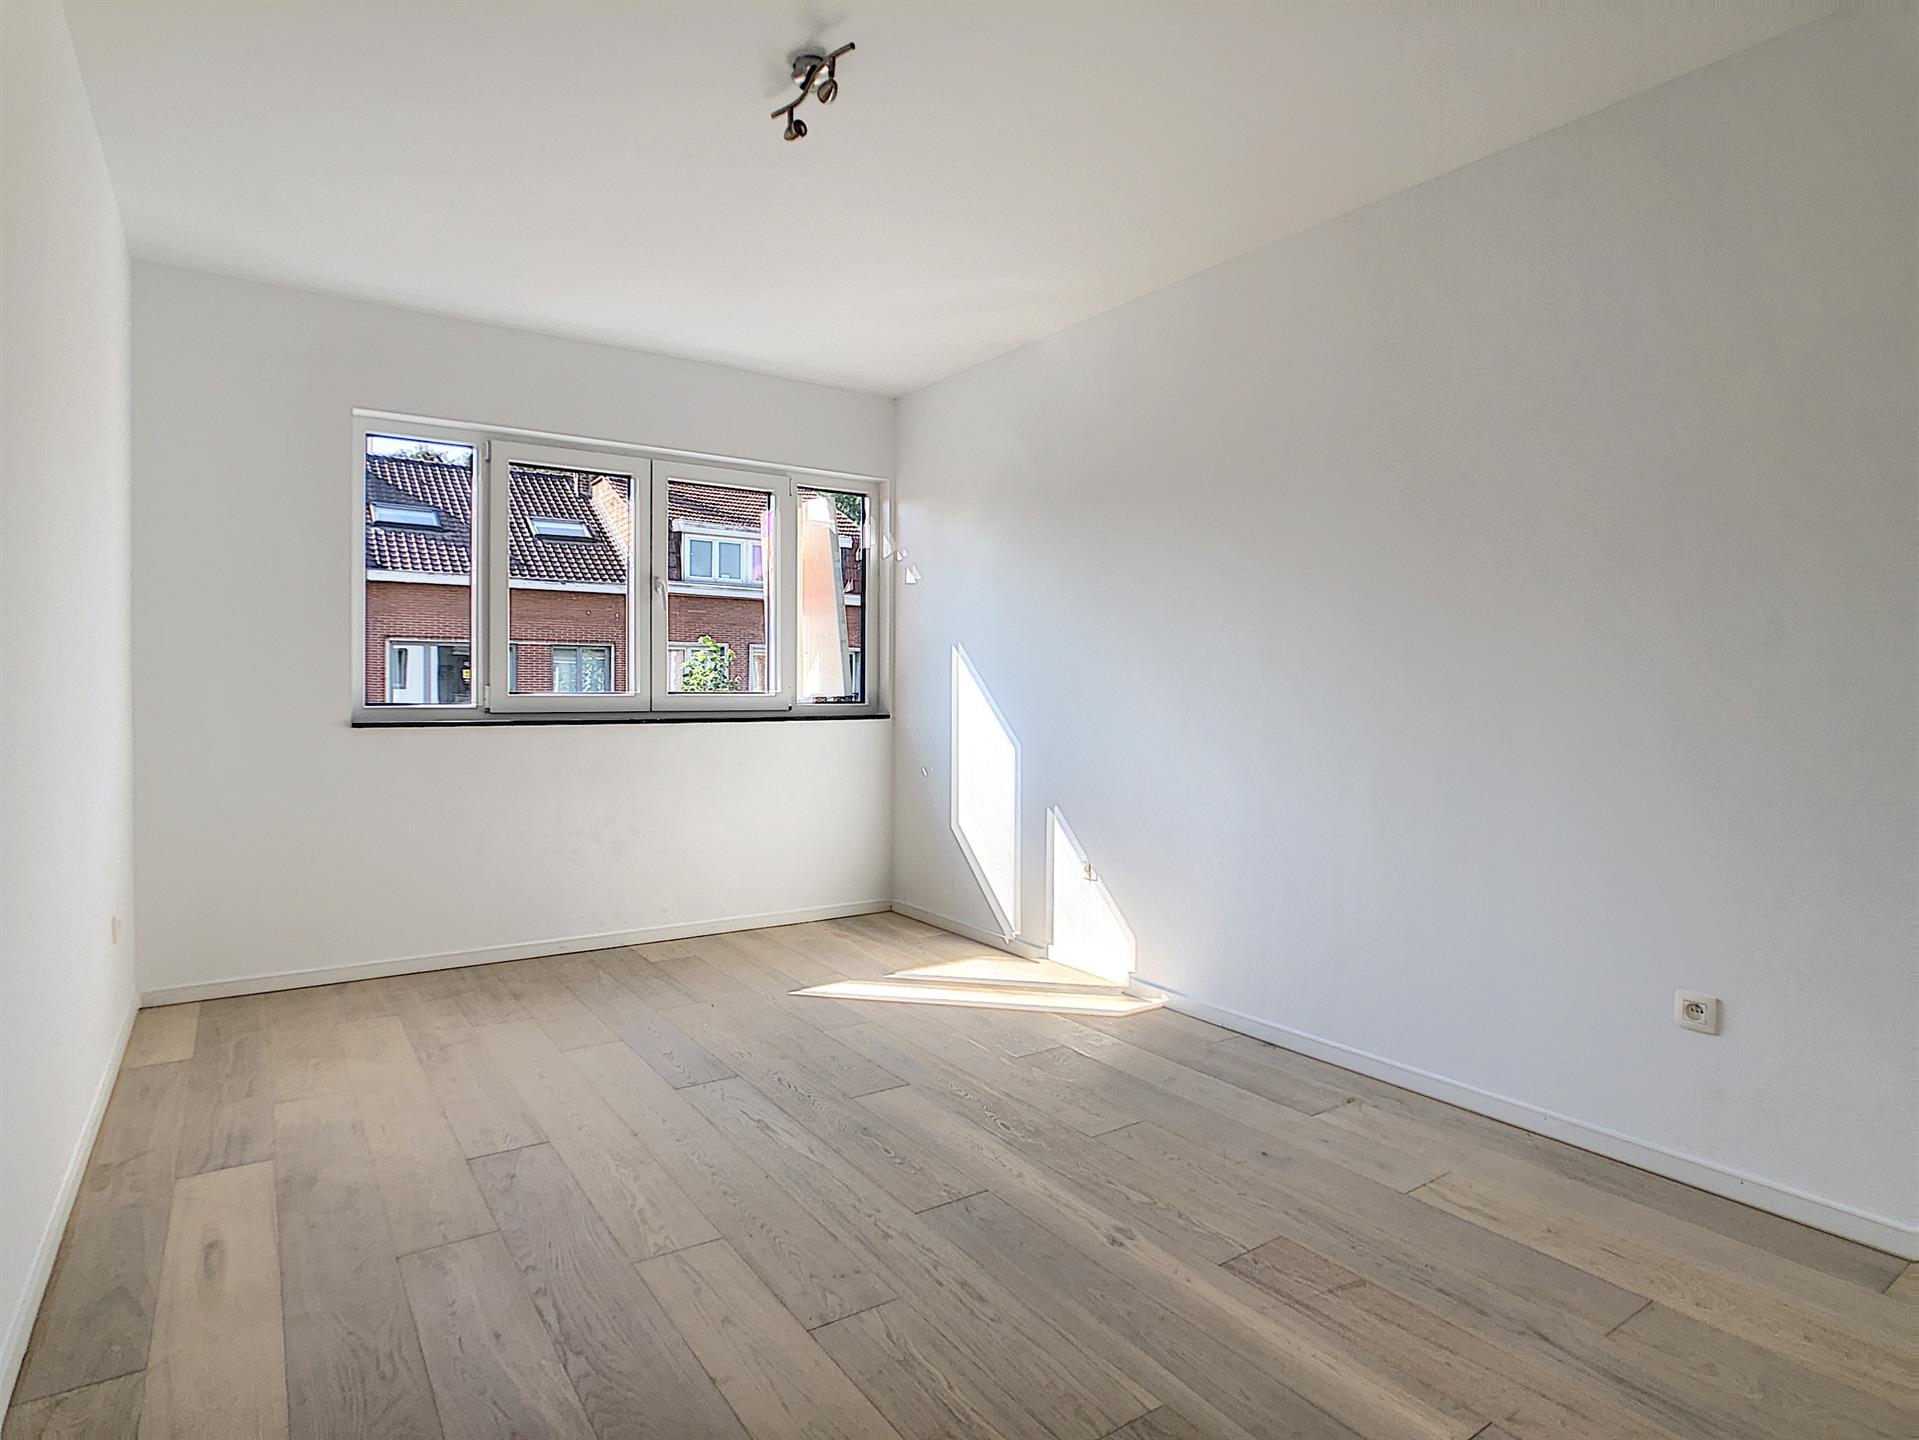 Appartement - Anderlecht - #4252388-28